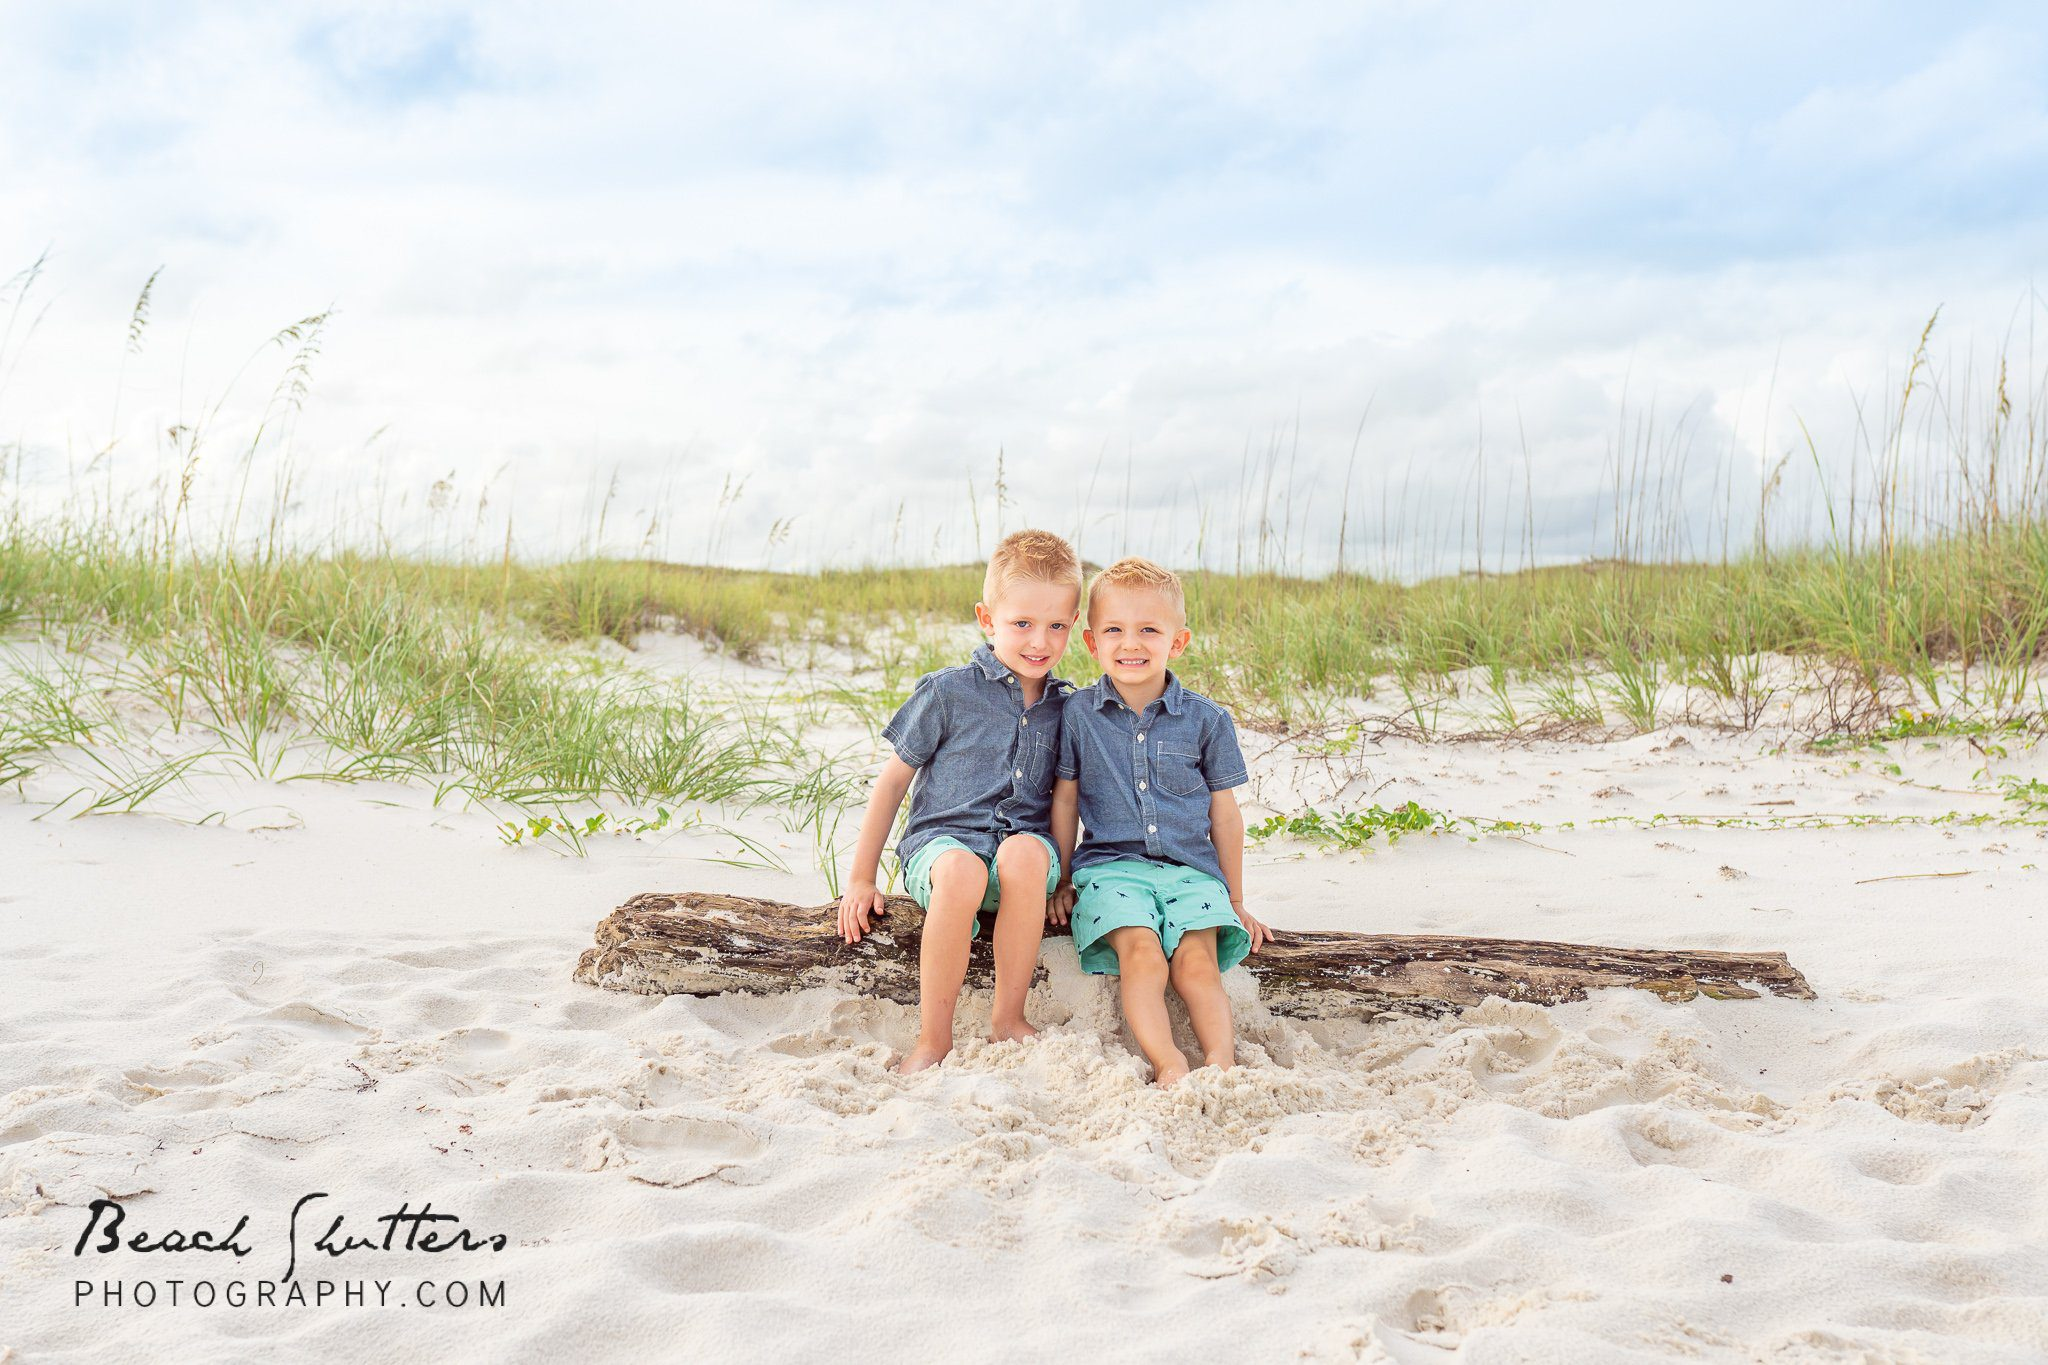 beach portraits by Beach Shutters Photography